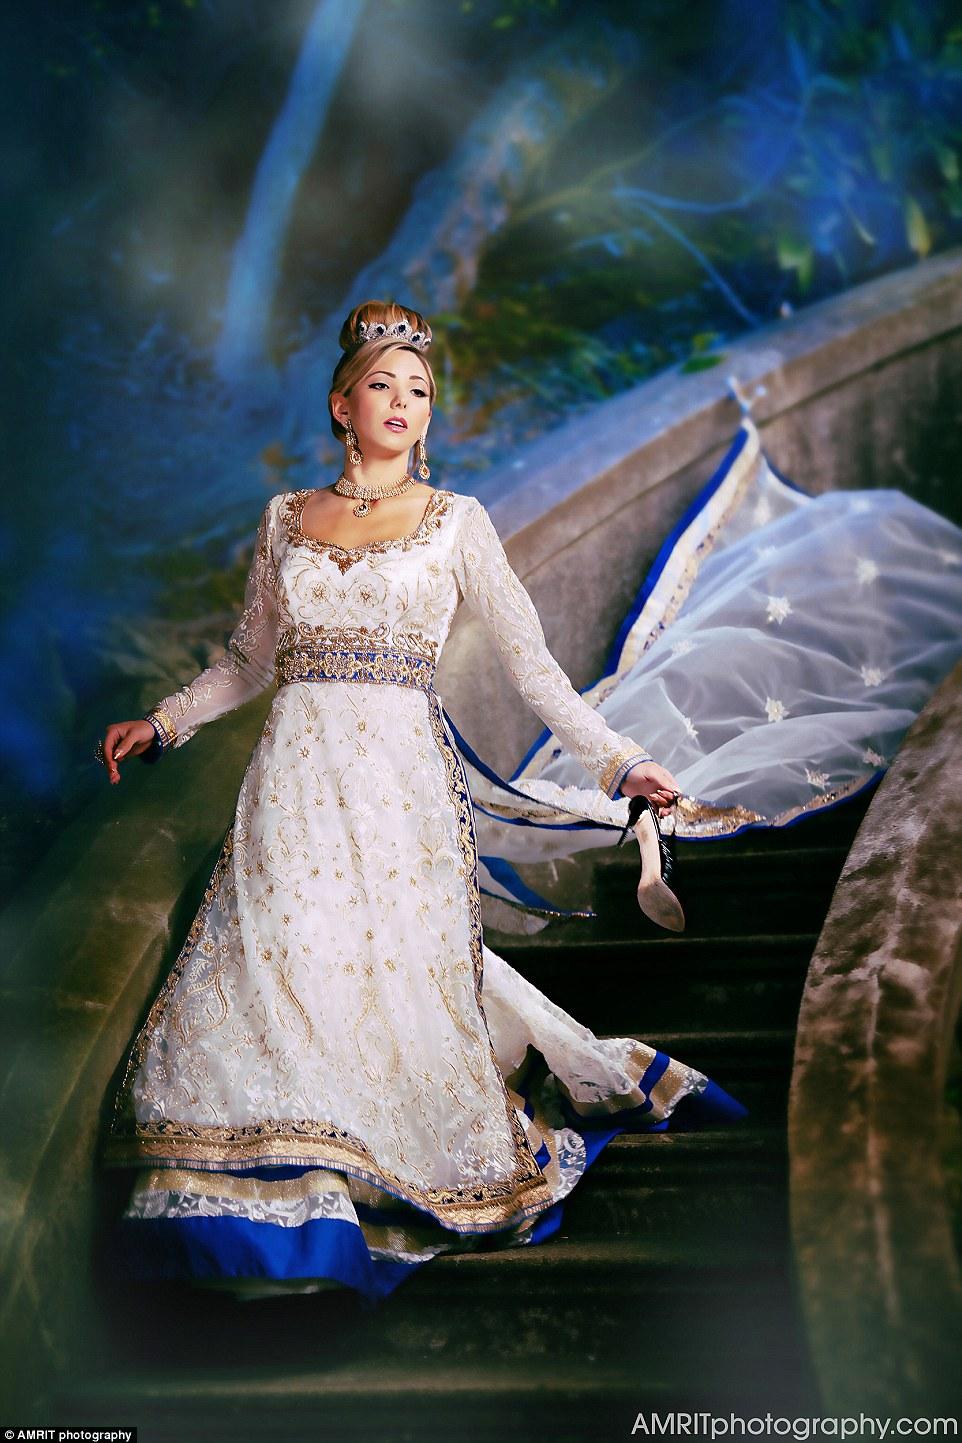 princesse disney indienne cendrillon